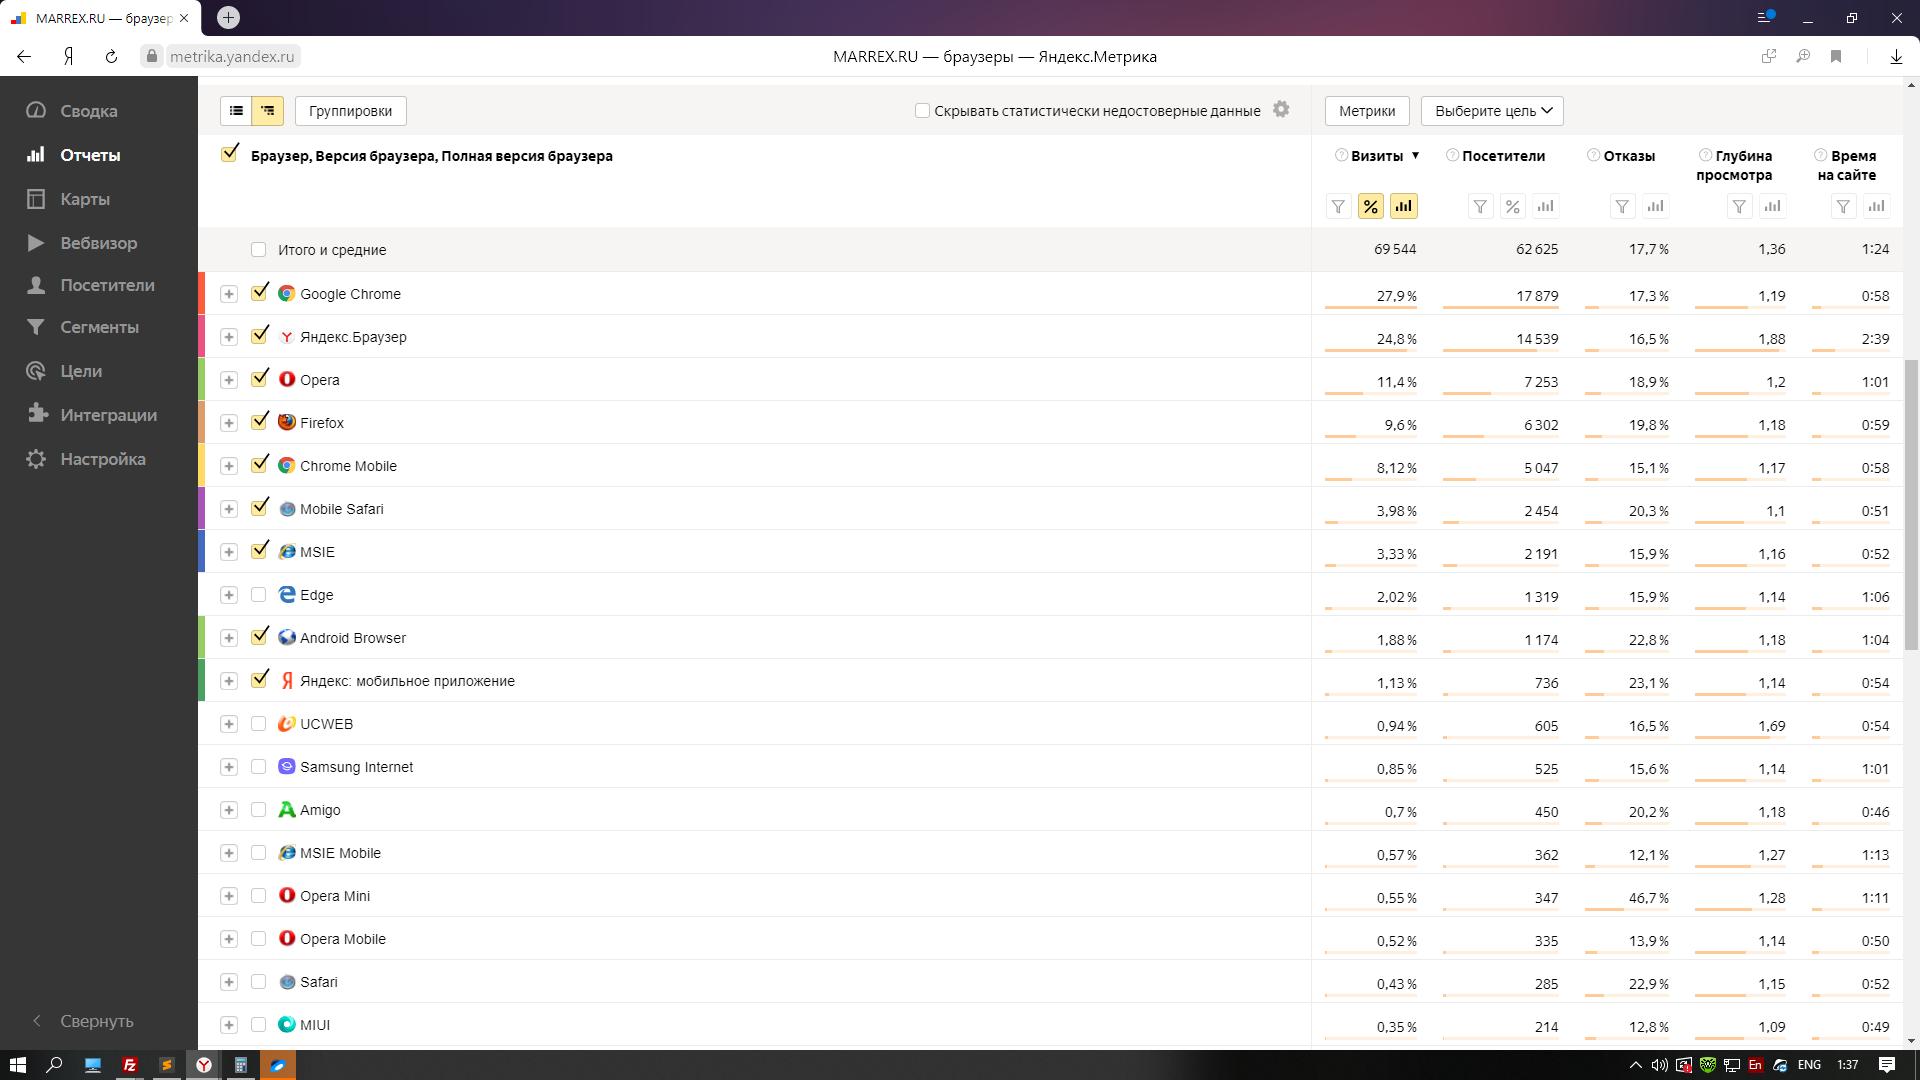 Самый популярный браузер 2017 года